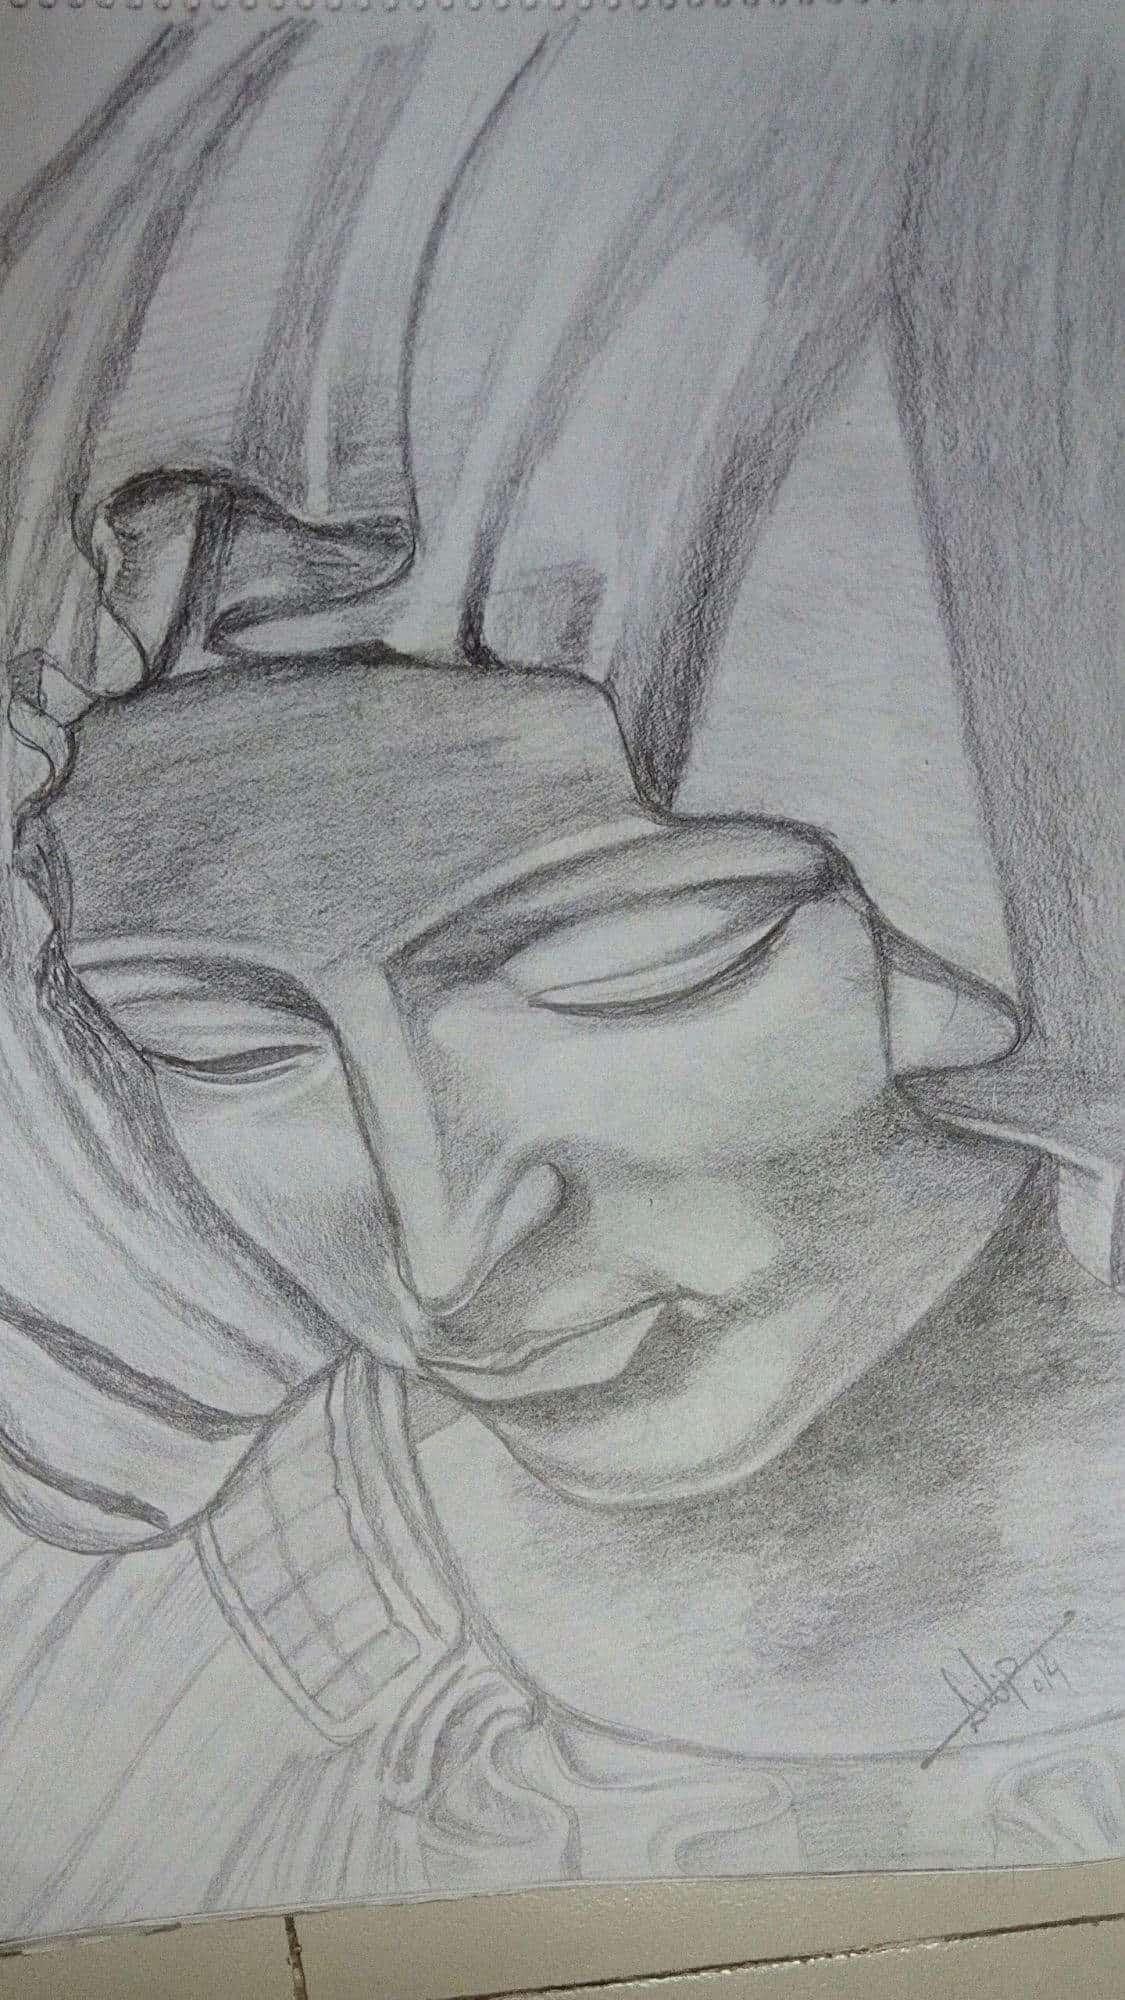 Sketch shravasti drawing classes photos jawahar chowk bhopal painting classes